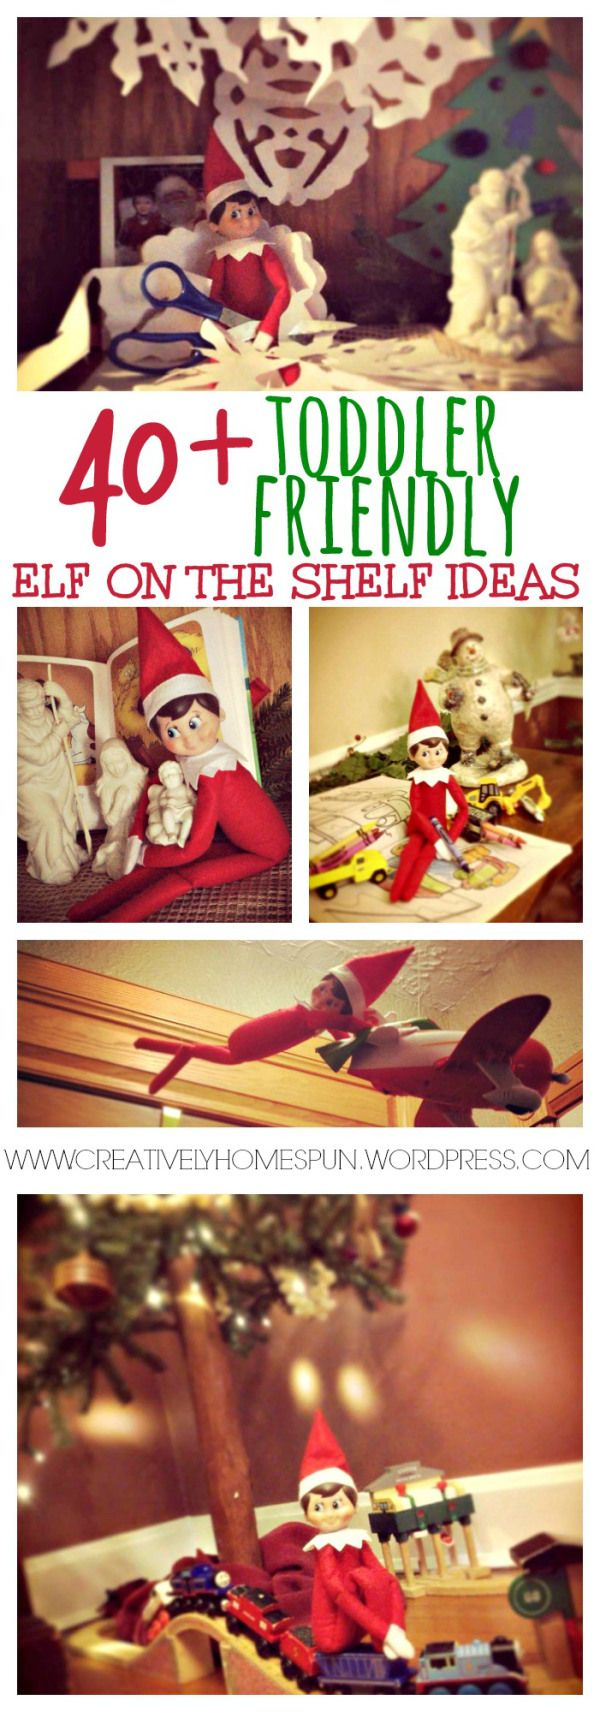 40+ Toddler Friendly Elf on the Shelf Ideas #elfontheshelf #toddleractivities #holidaytradition